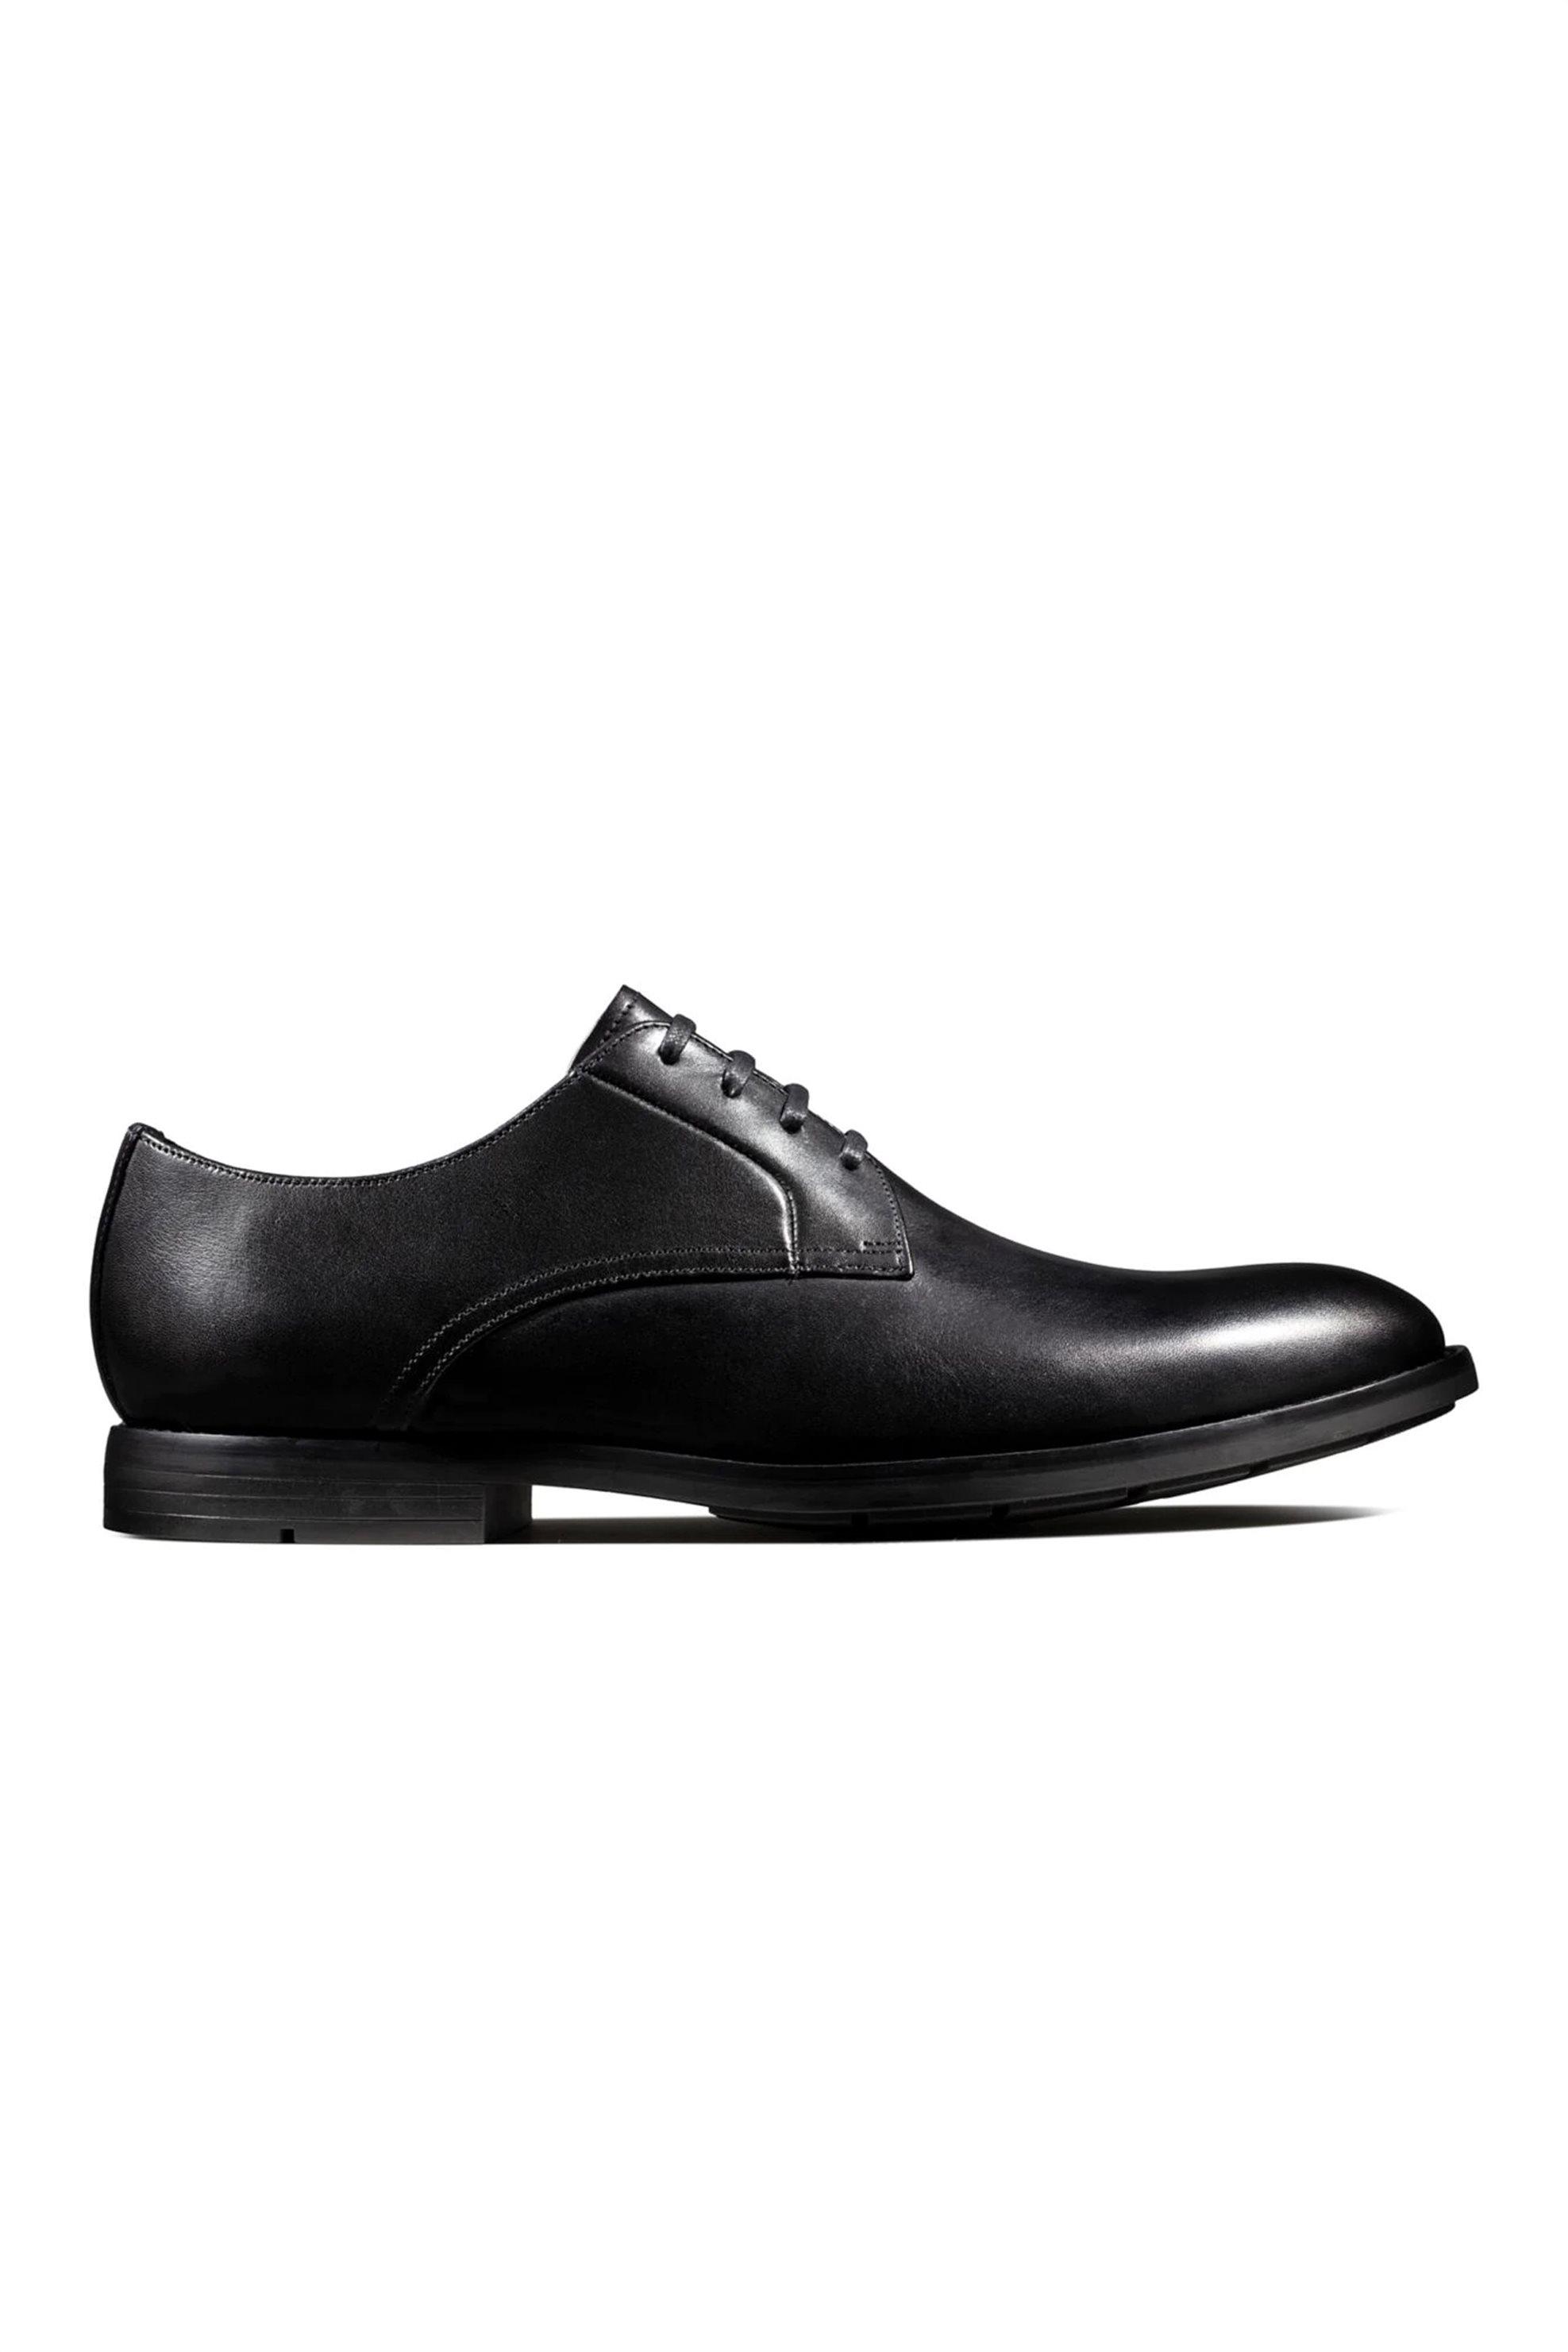 Clarks ανδρικά δερμάτινα παπούτσια oxford «Ronnie Walk' – 26143810 – Μαύρο